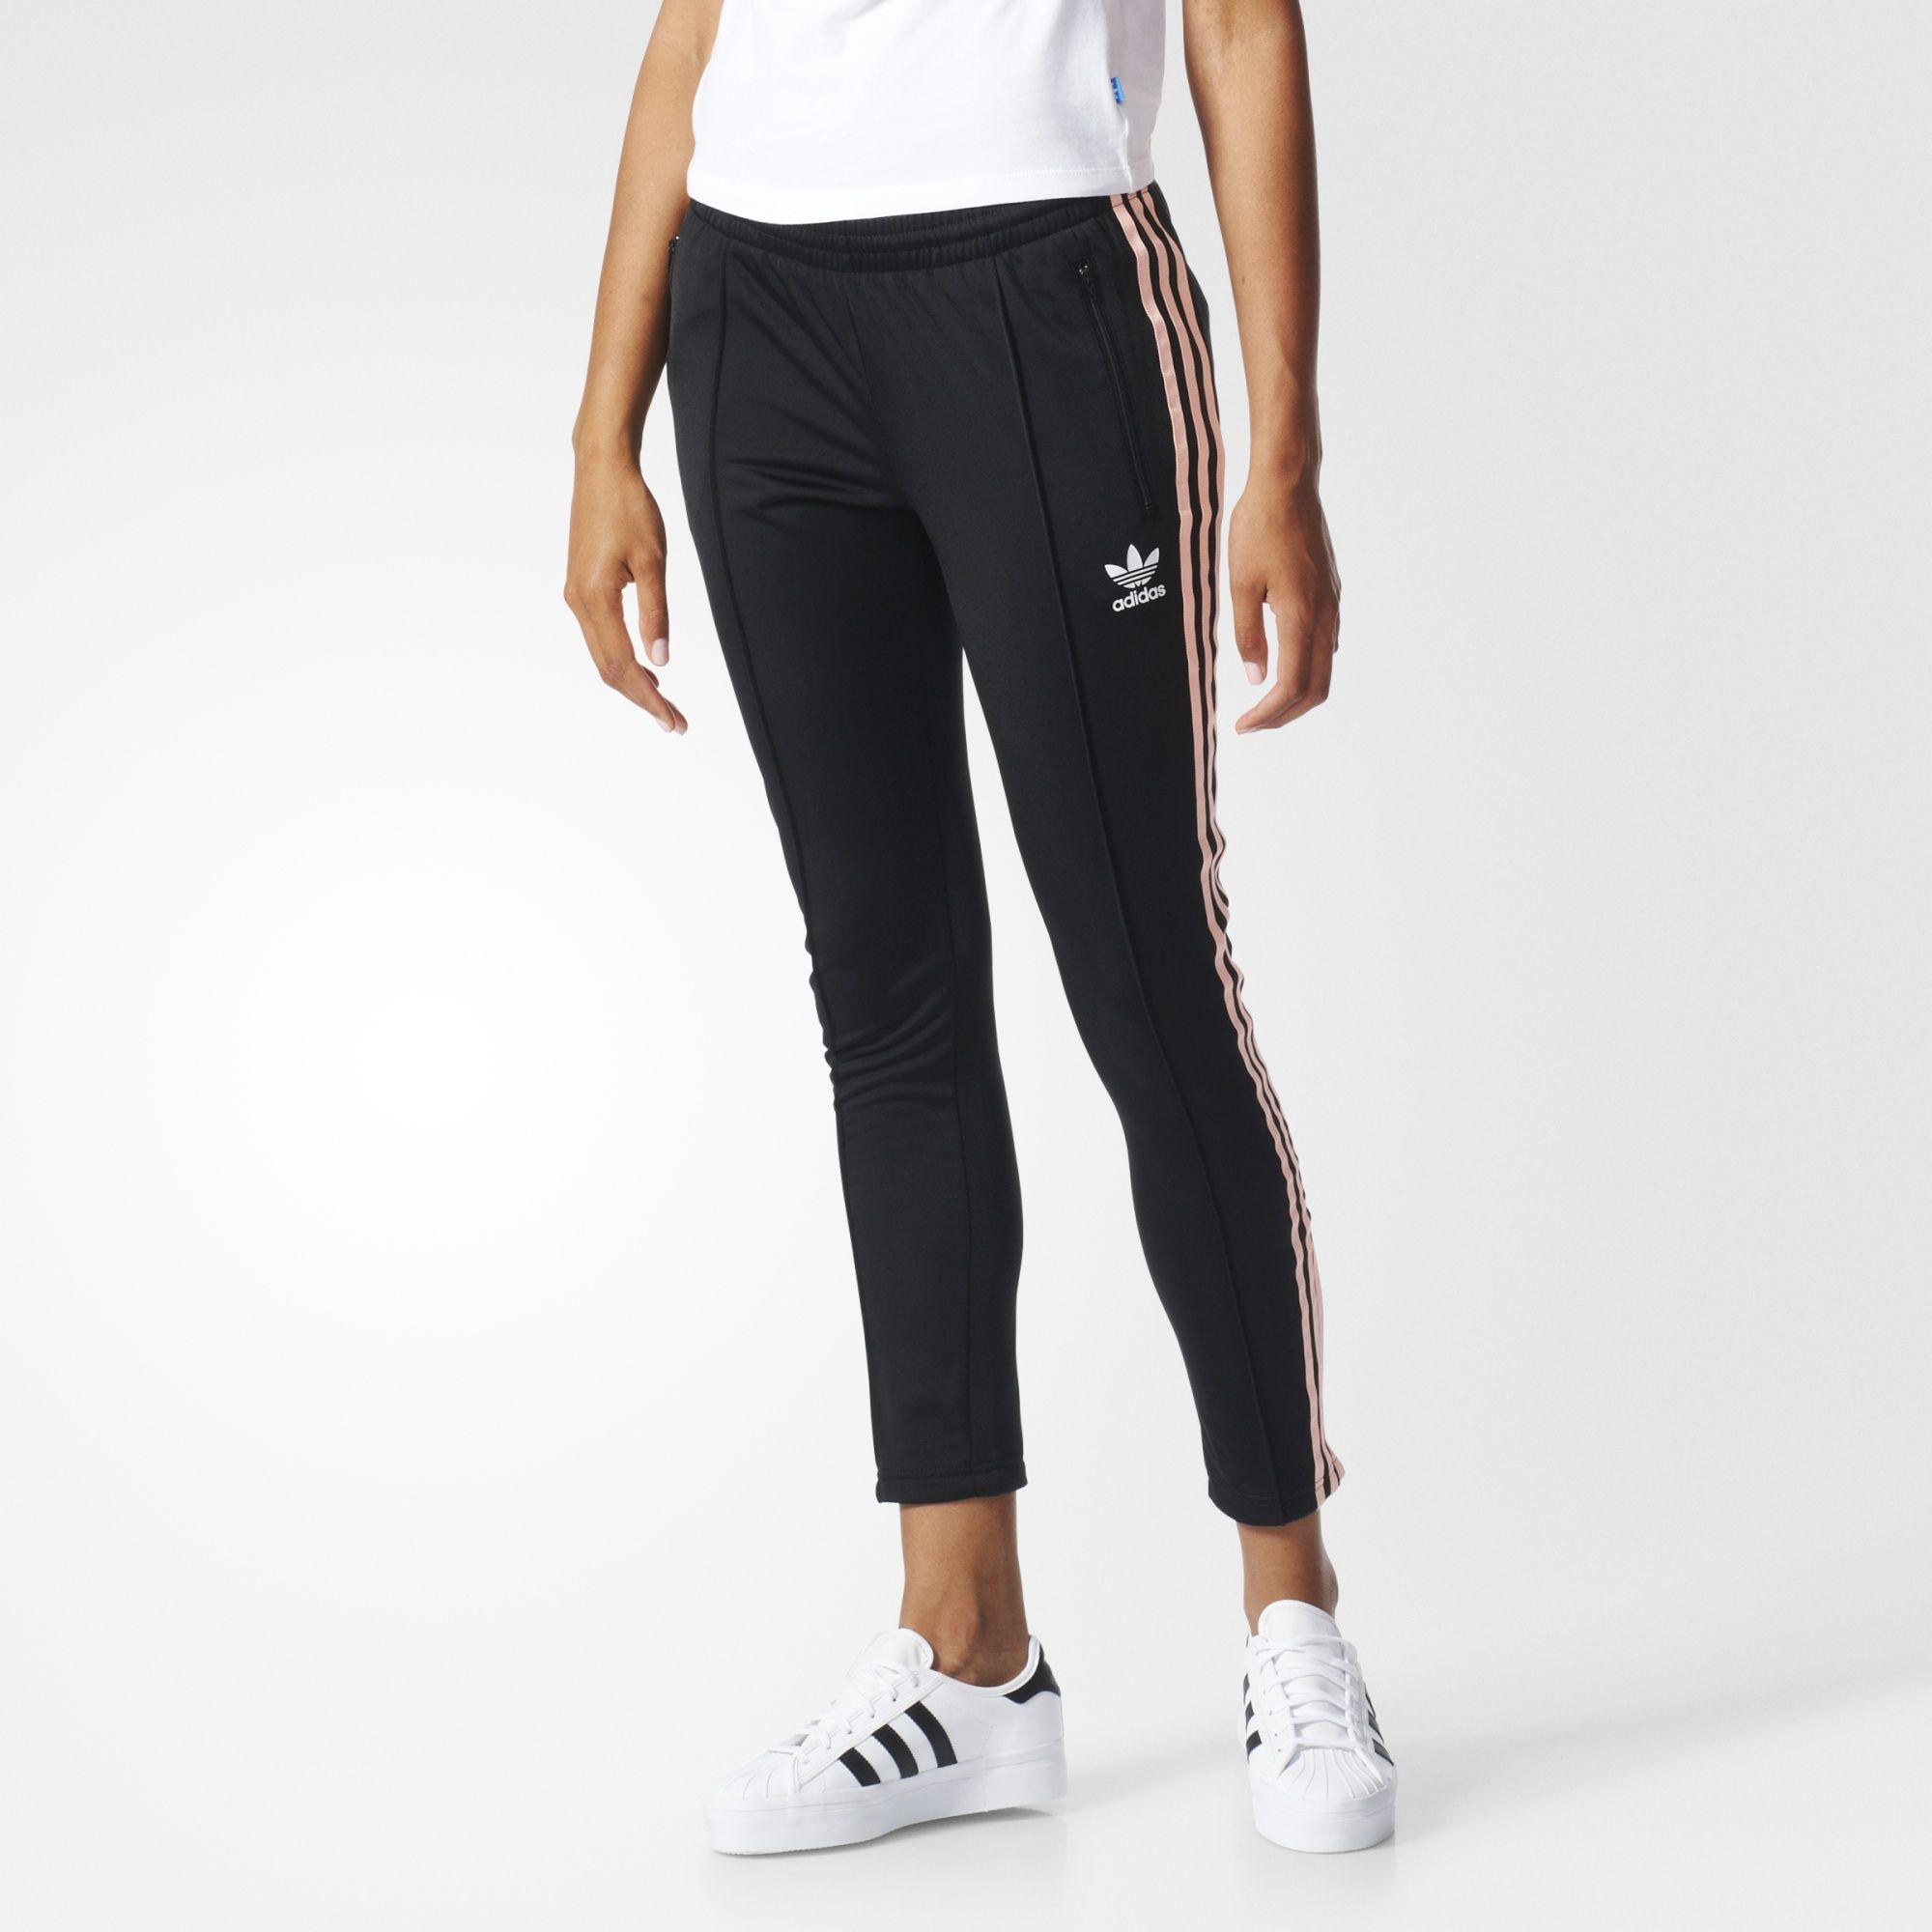 adidas - Superstar Trainingshose | Pants for women, Track ...